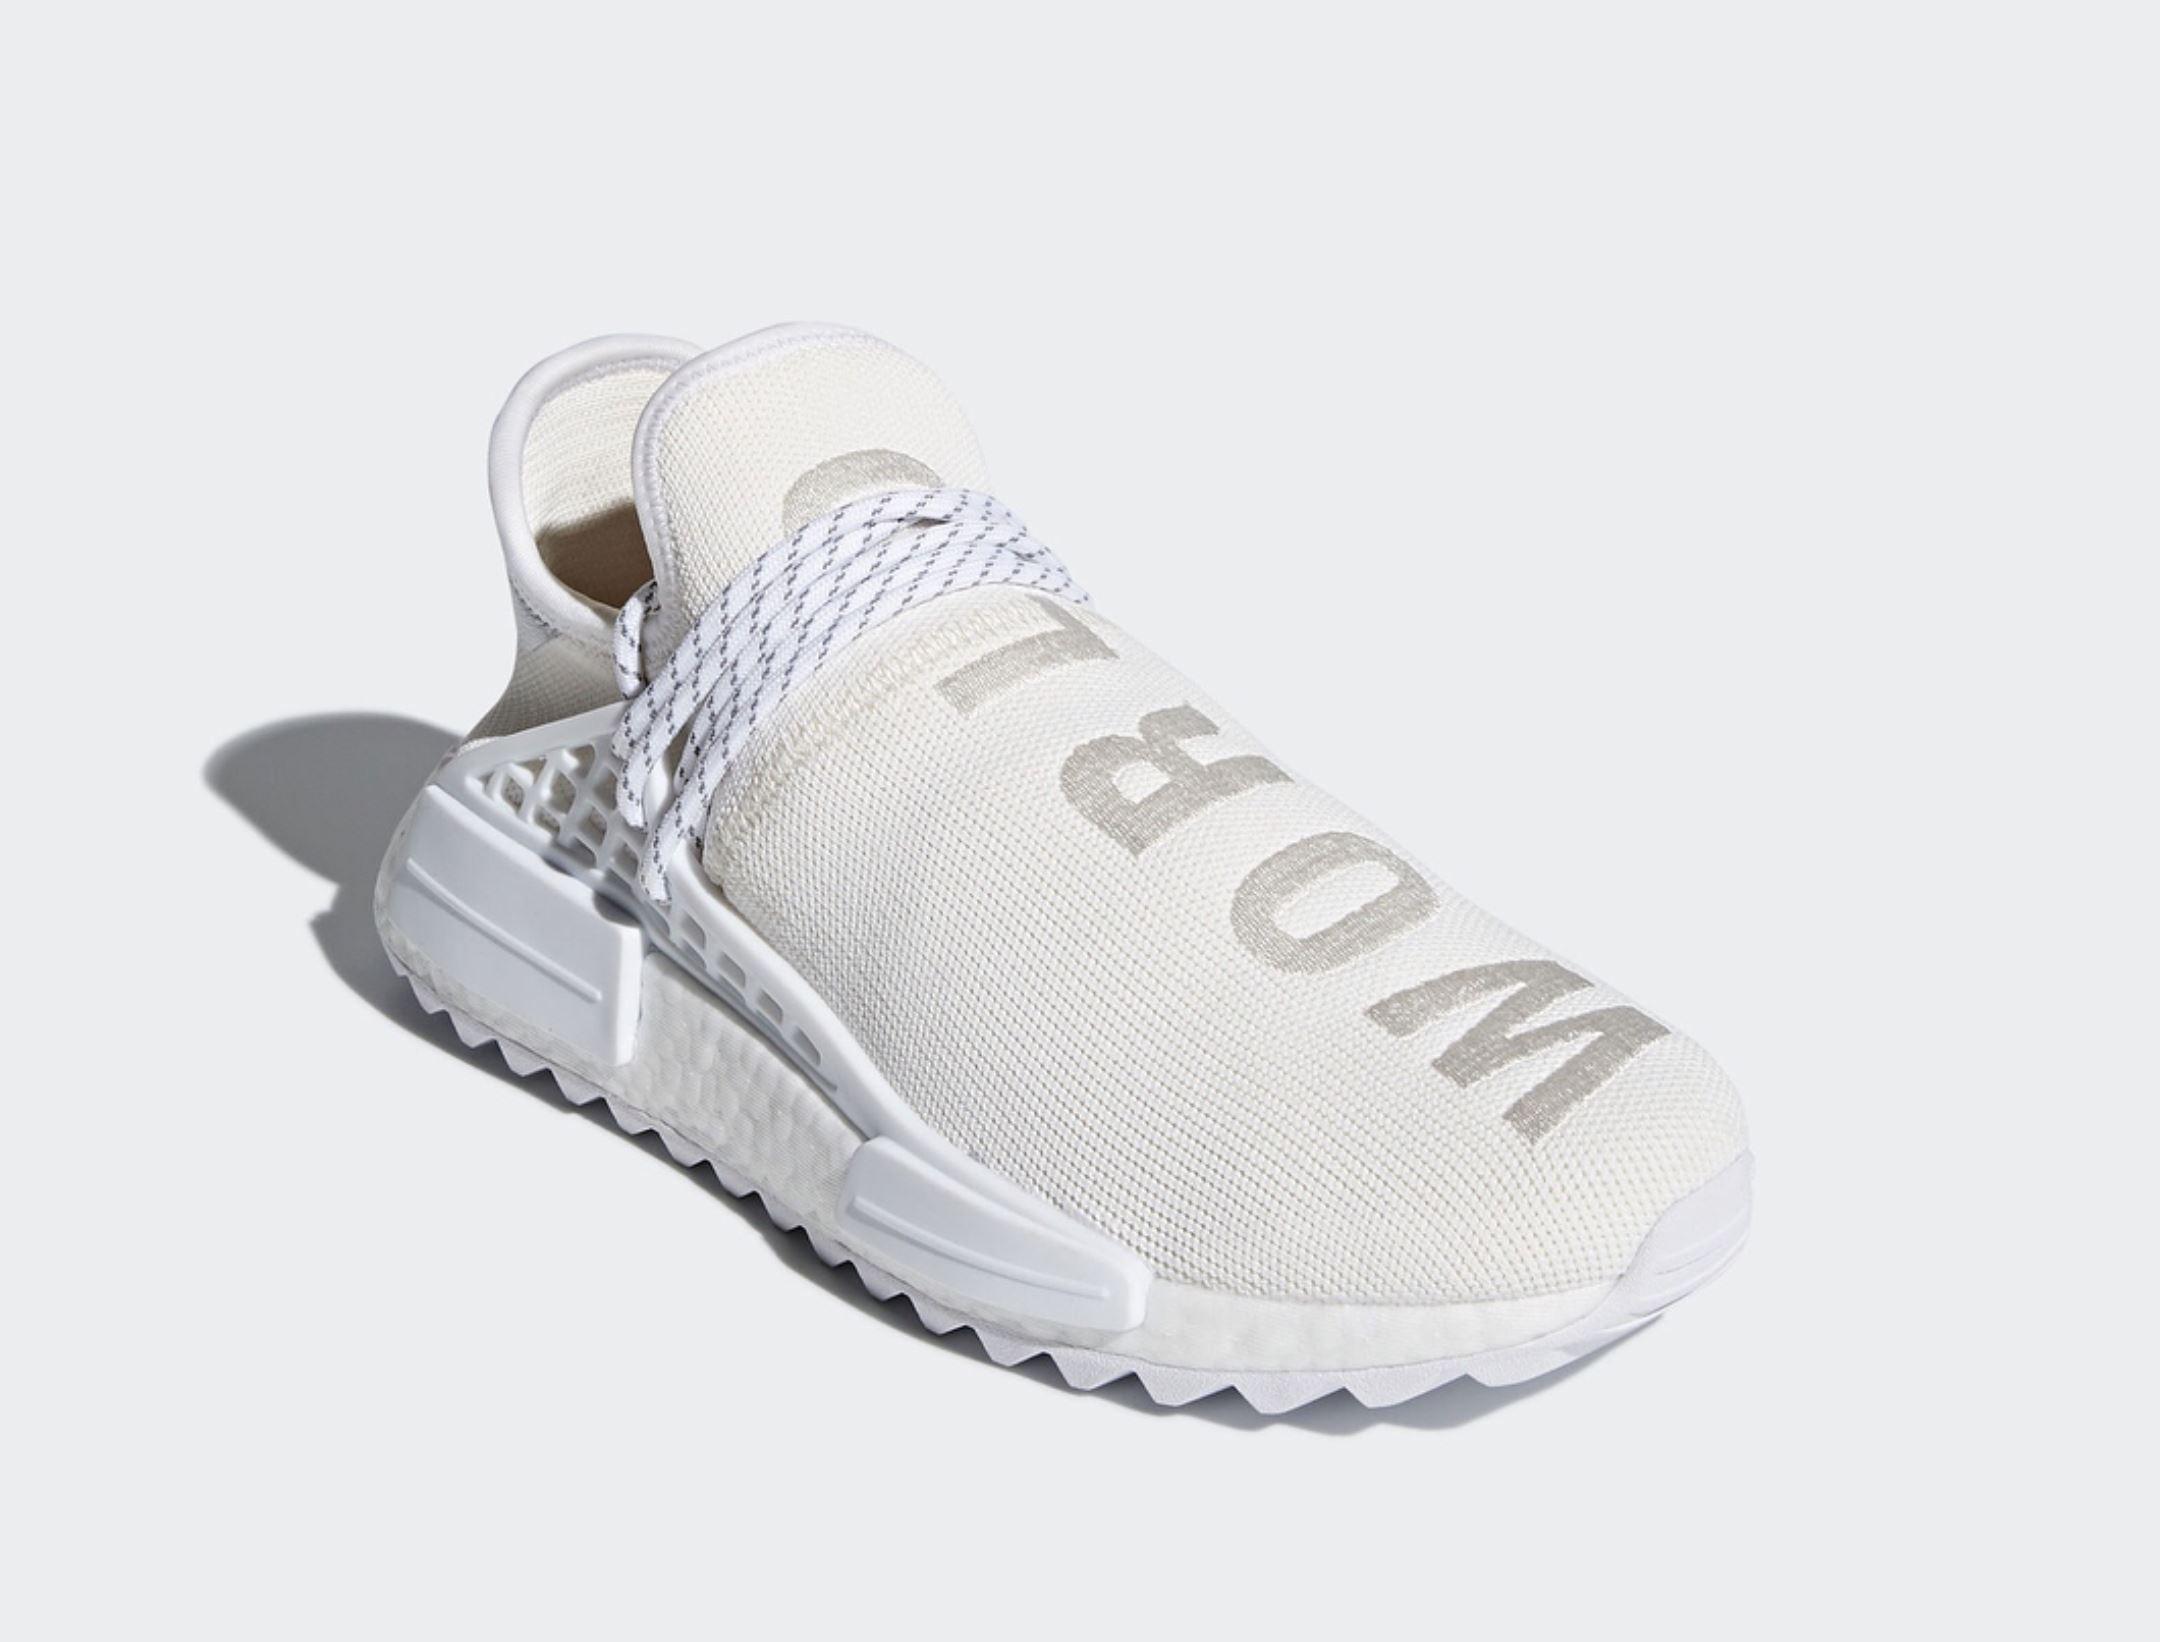 The White on White adidas Originals Hu